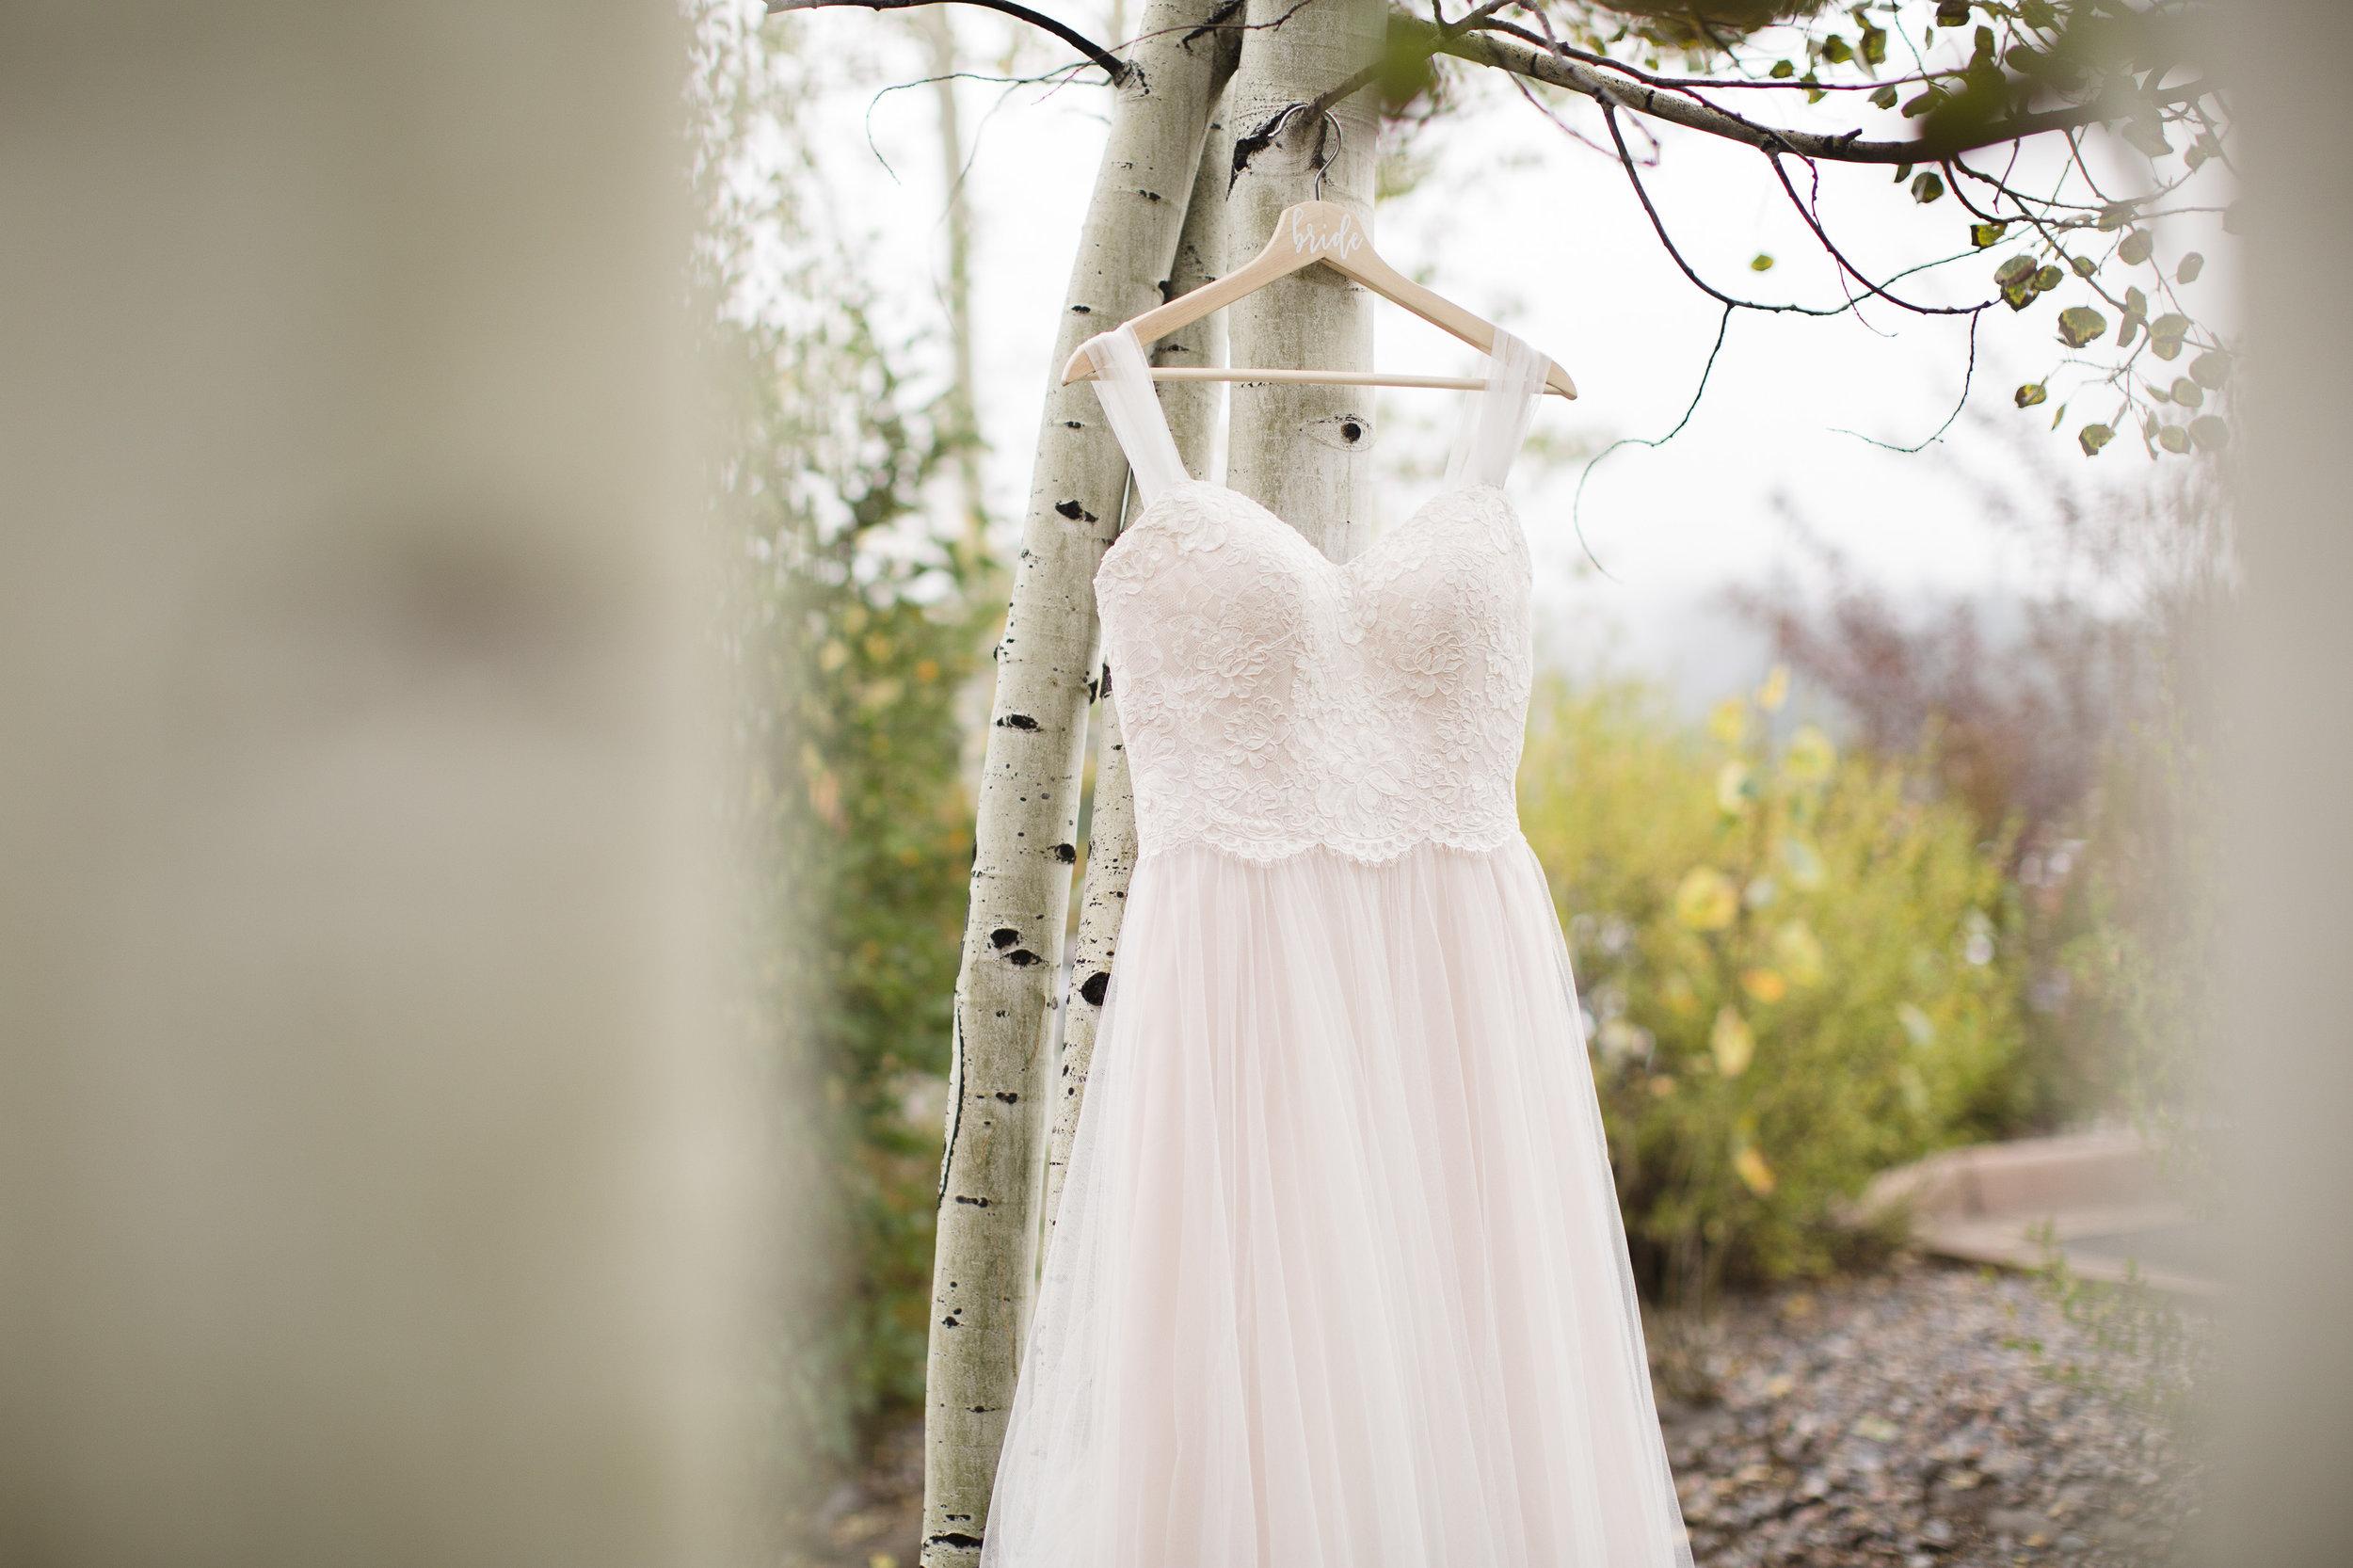 kristen-vance-three-sisters-barn-evergreen-colorado-wedding-2017-2.jpg